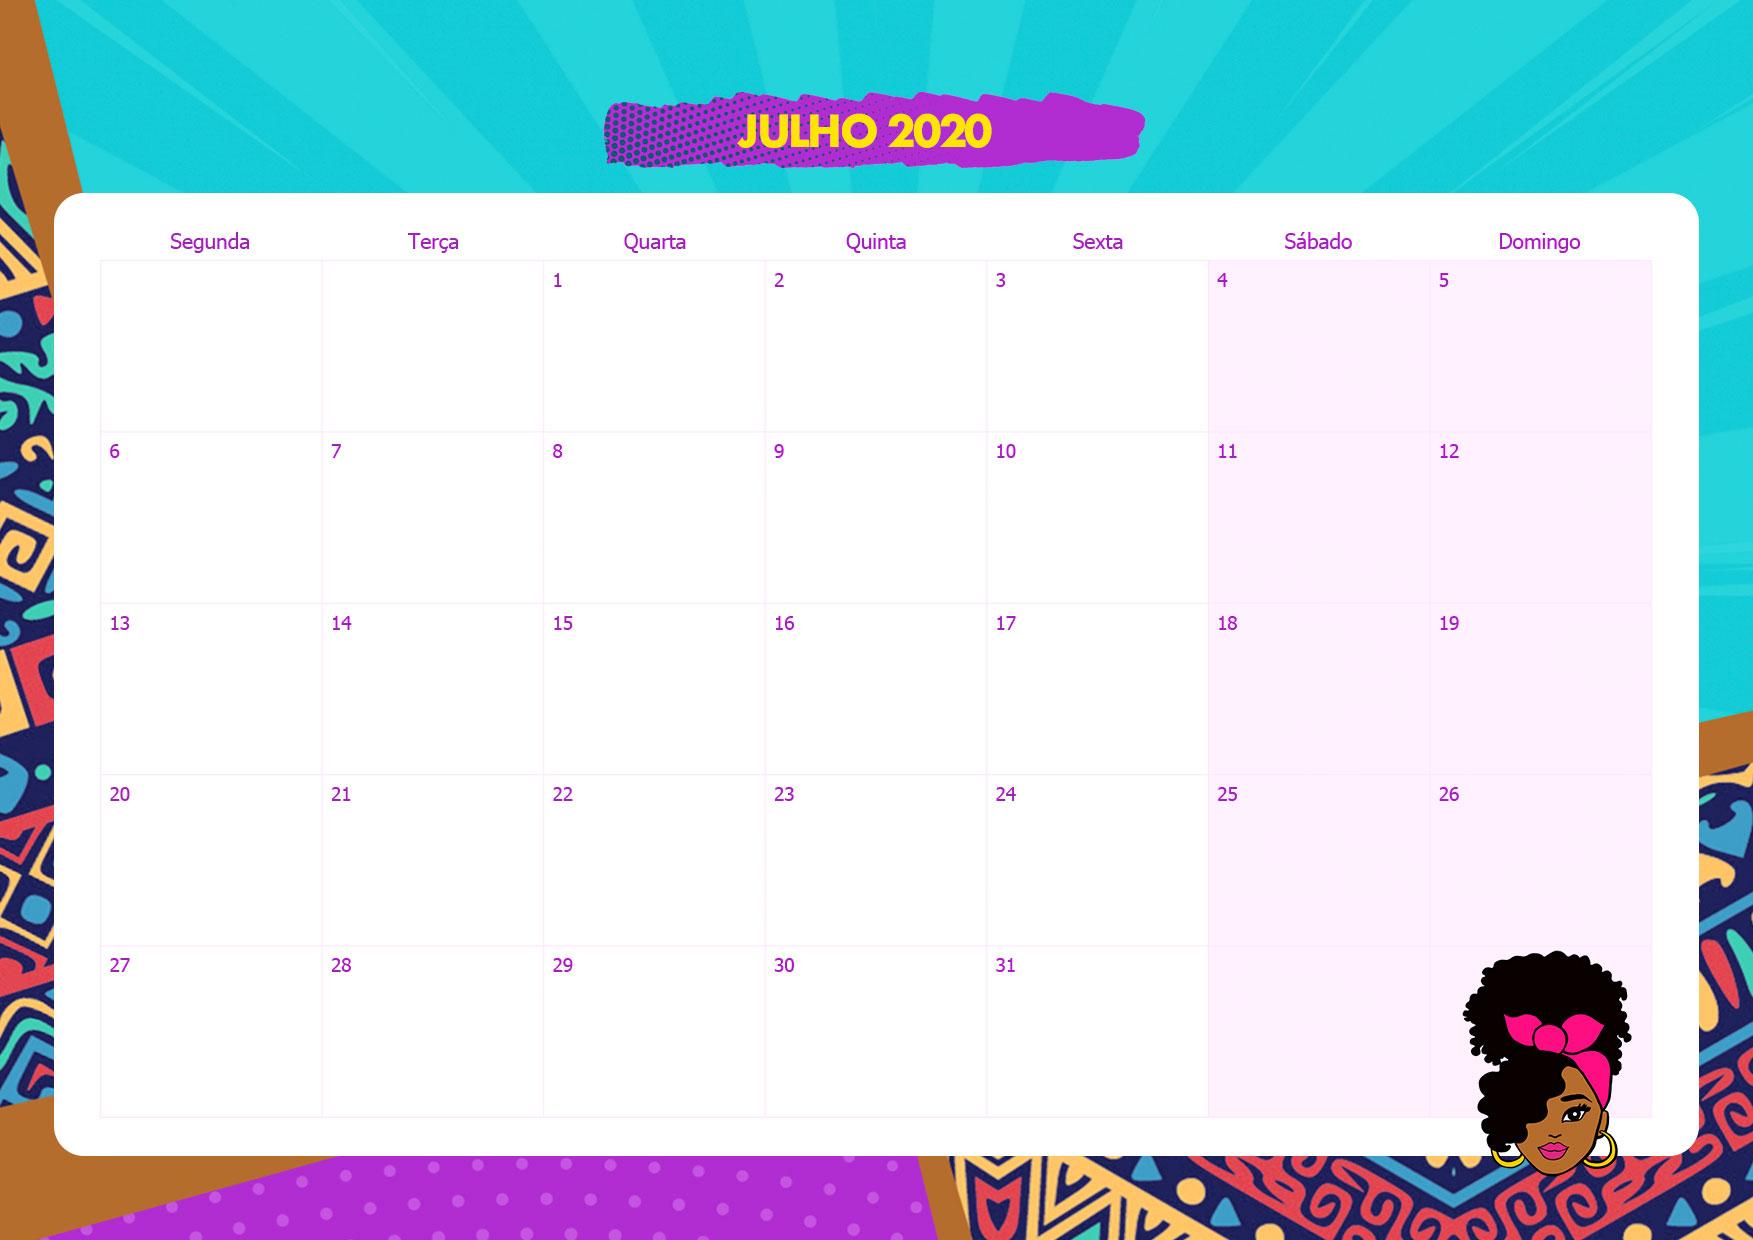 Calendario Mensal Mulher Afro Julho 2020